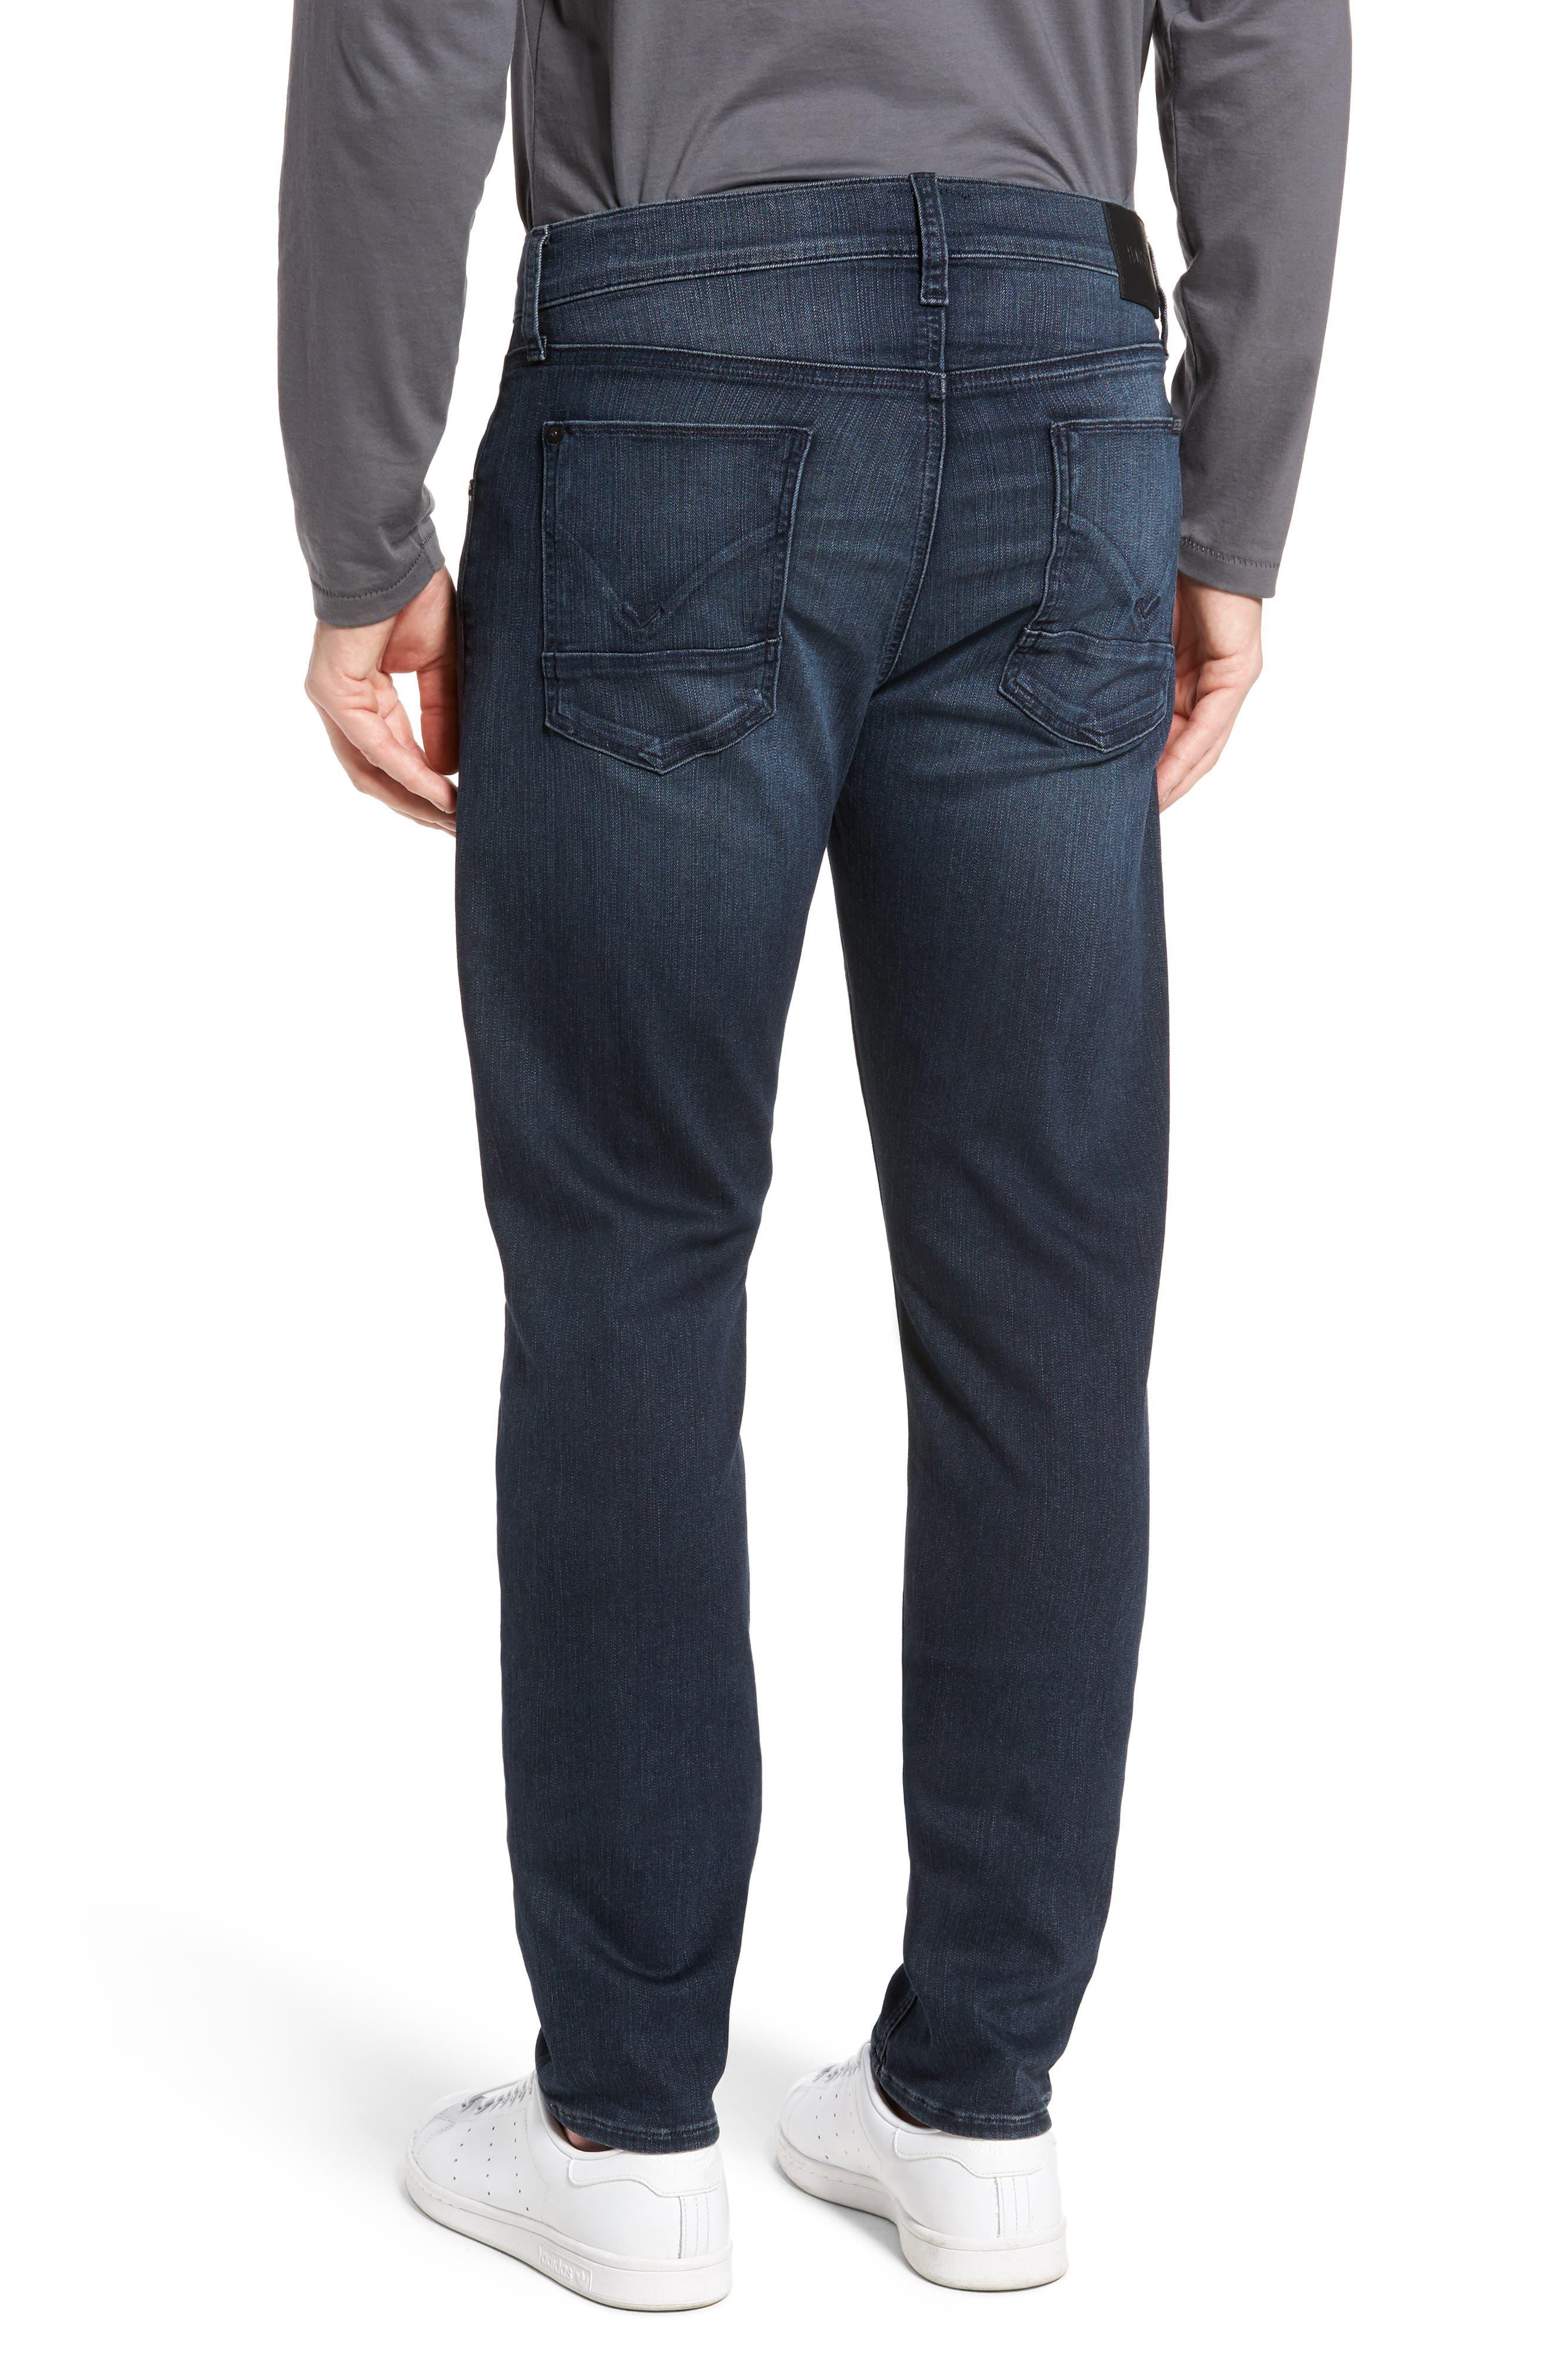 Blake Slim Fit Jeans,                             Alternate thumbnail 2, color,                             400